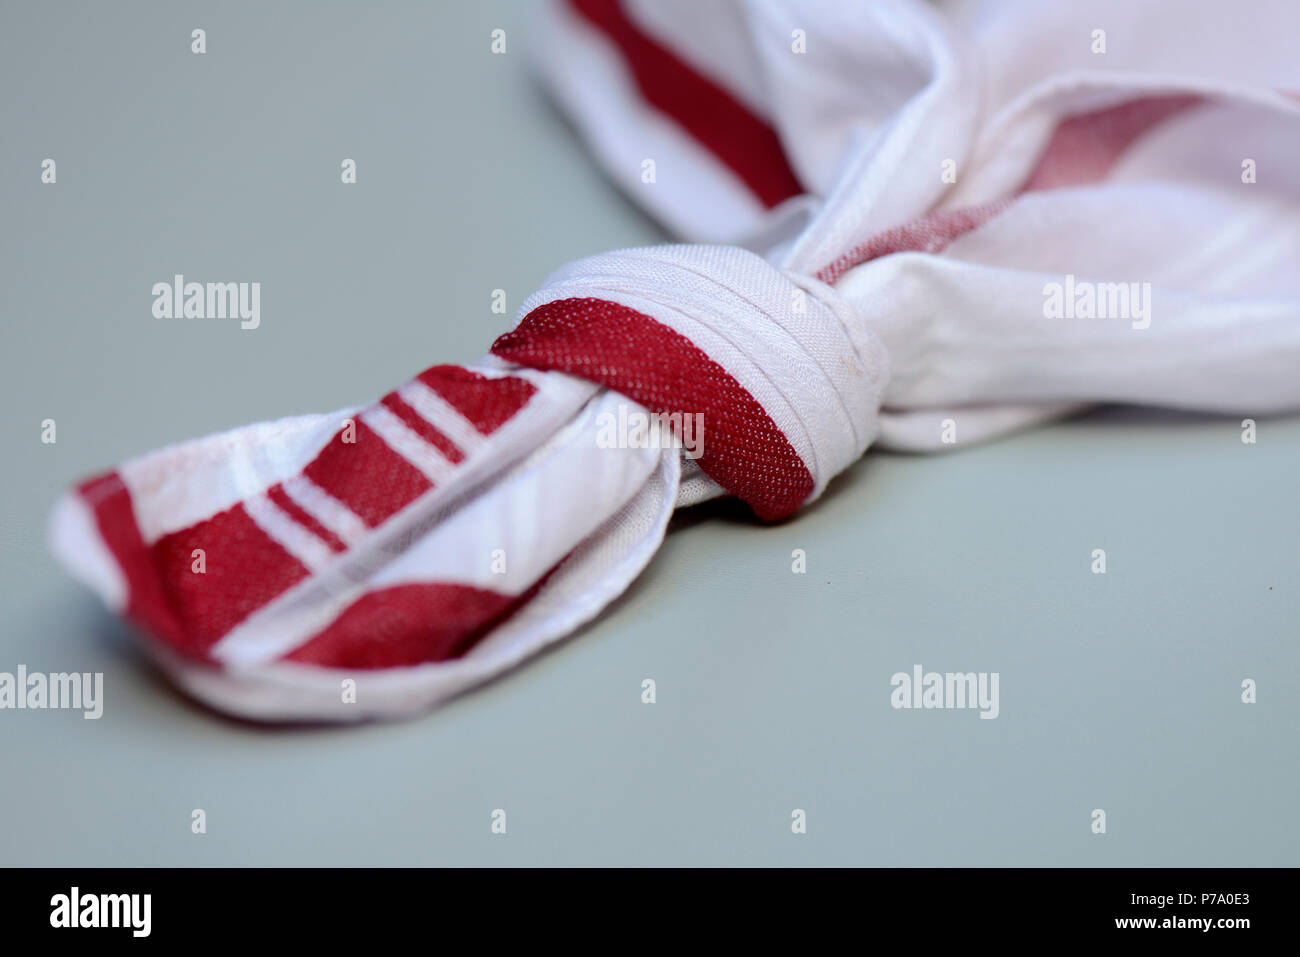 Knot in handkerchief Stock Photo